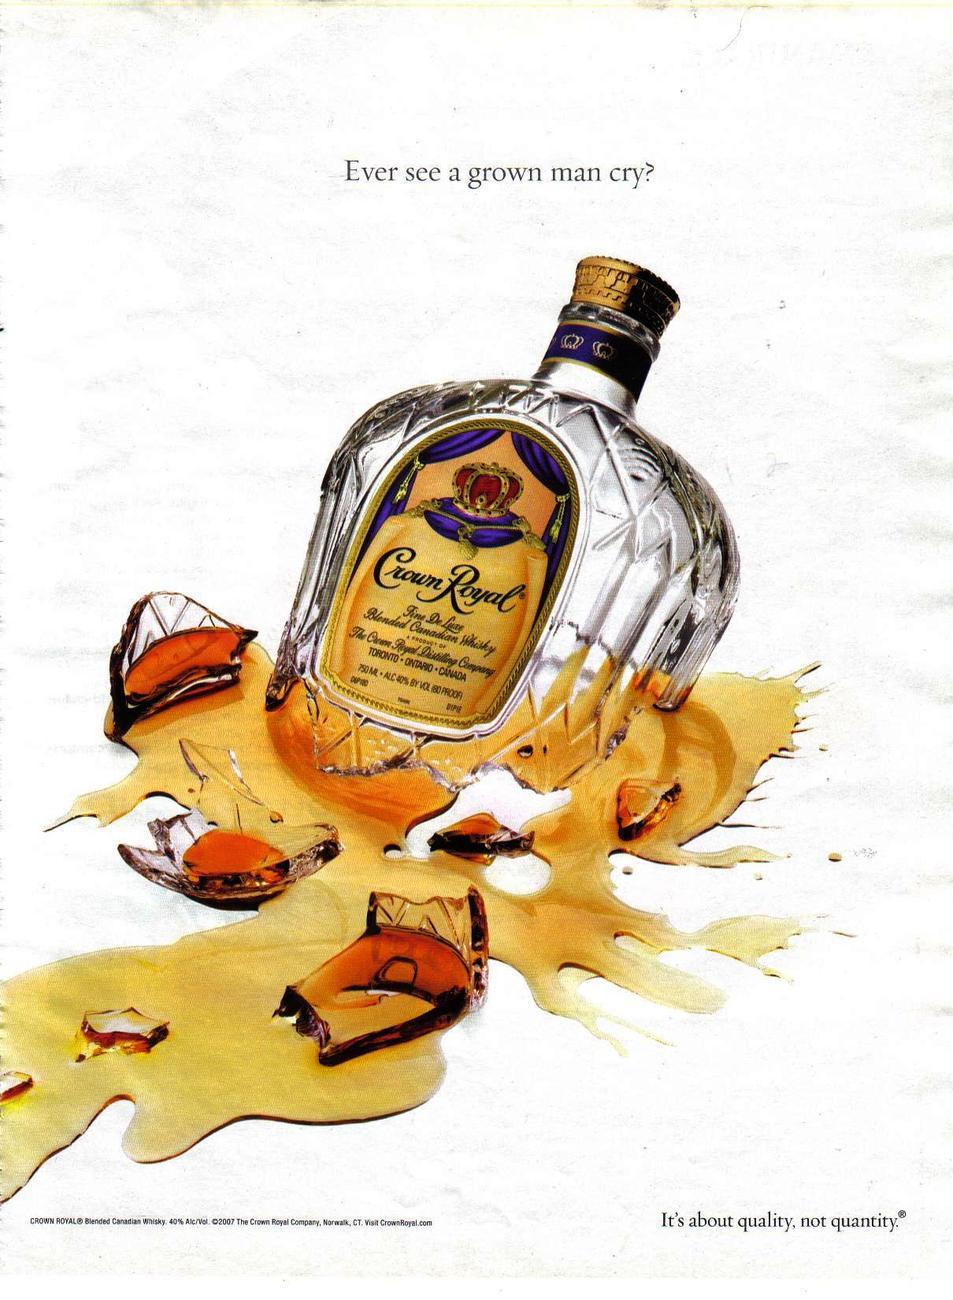 Crown Royal Whisky Full Page Color Print Ad - Original -  - Crown Royal